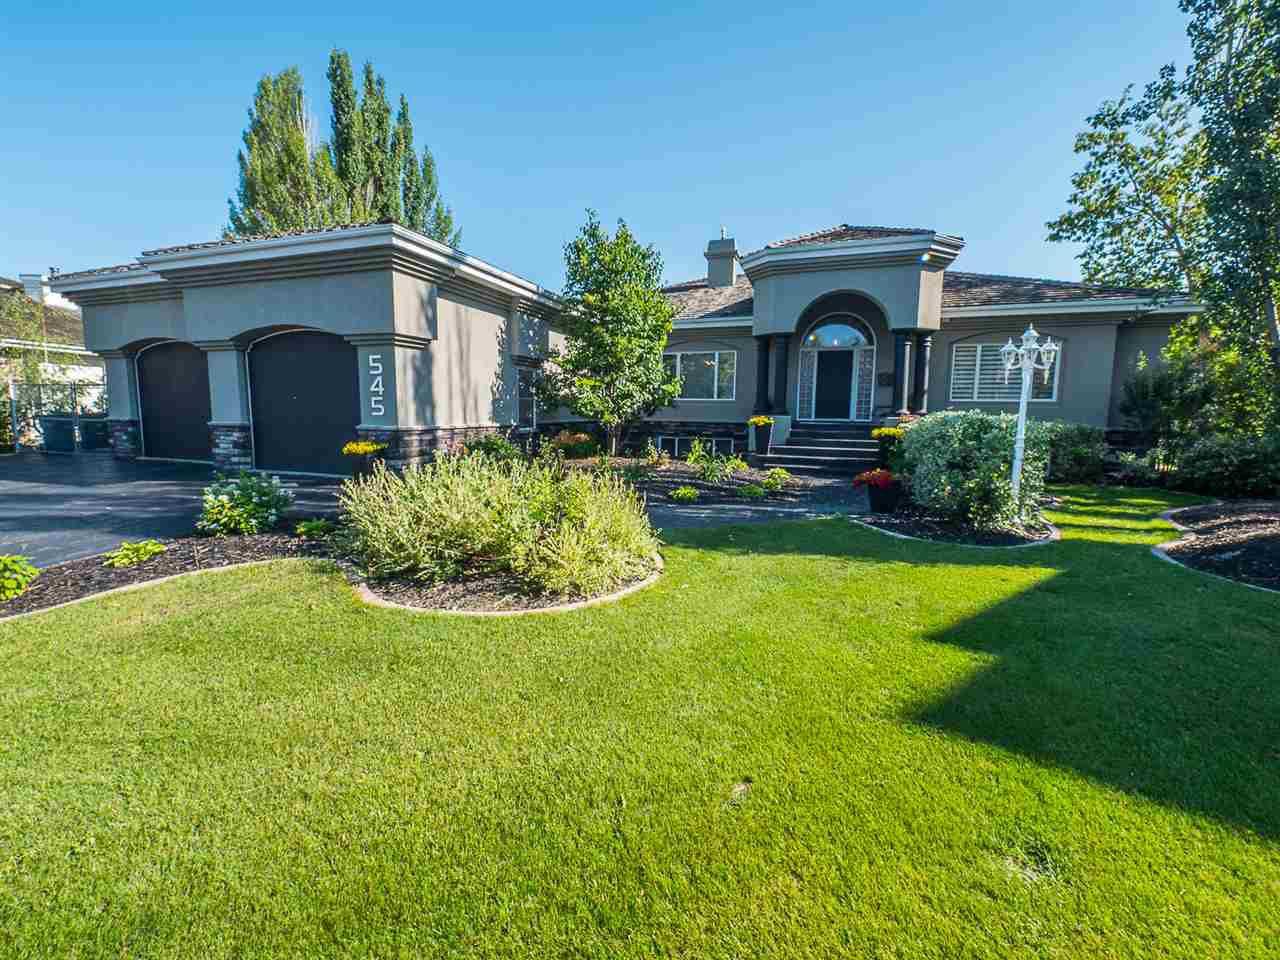 Main Photo: 545 ESTATE Drive: Sherwood Park House for sale : MLS®# E4145554